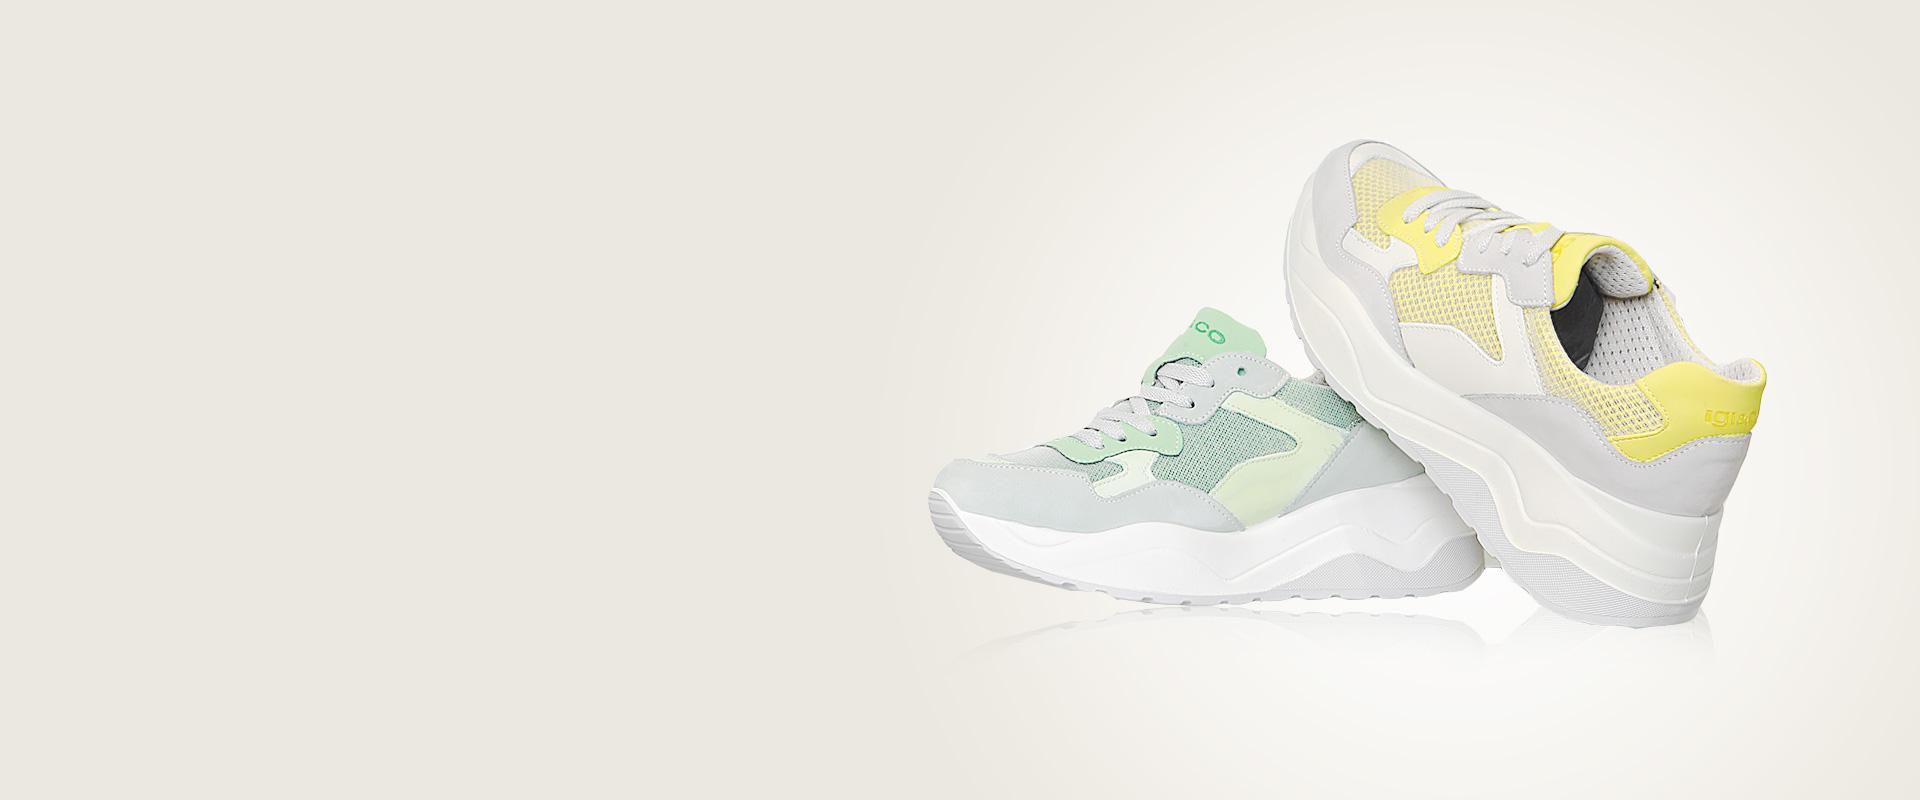 buy online fb75e 23905 Piera Calzature - scarpe moda torino - Piera Calzature